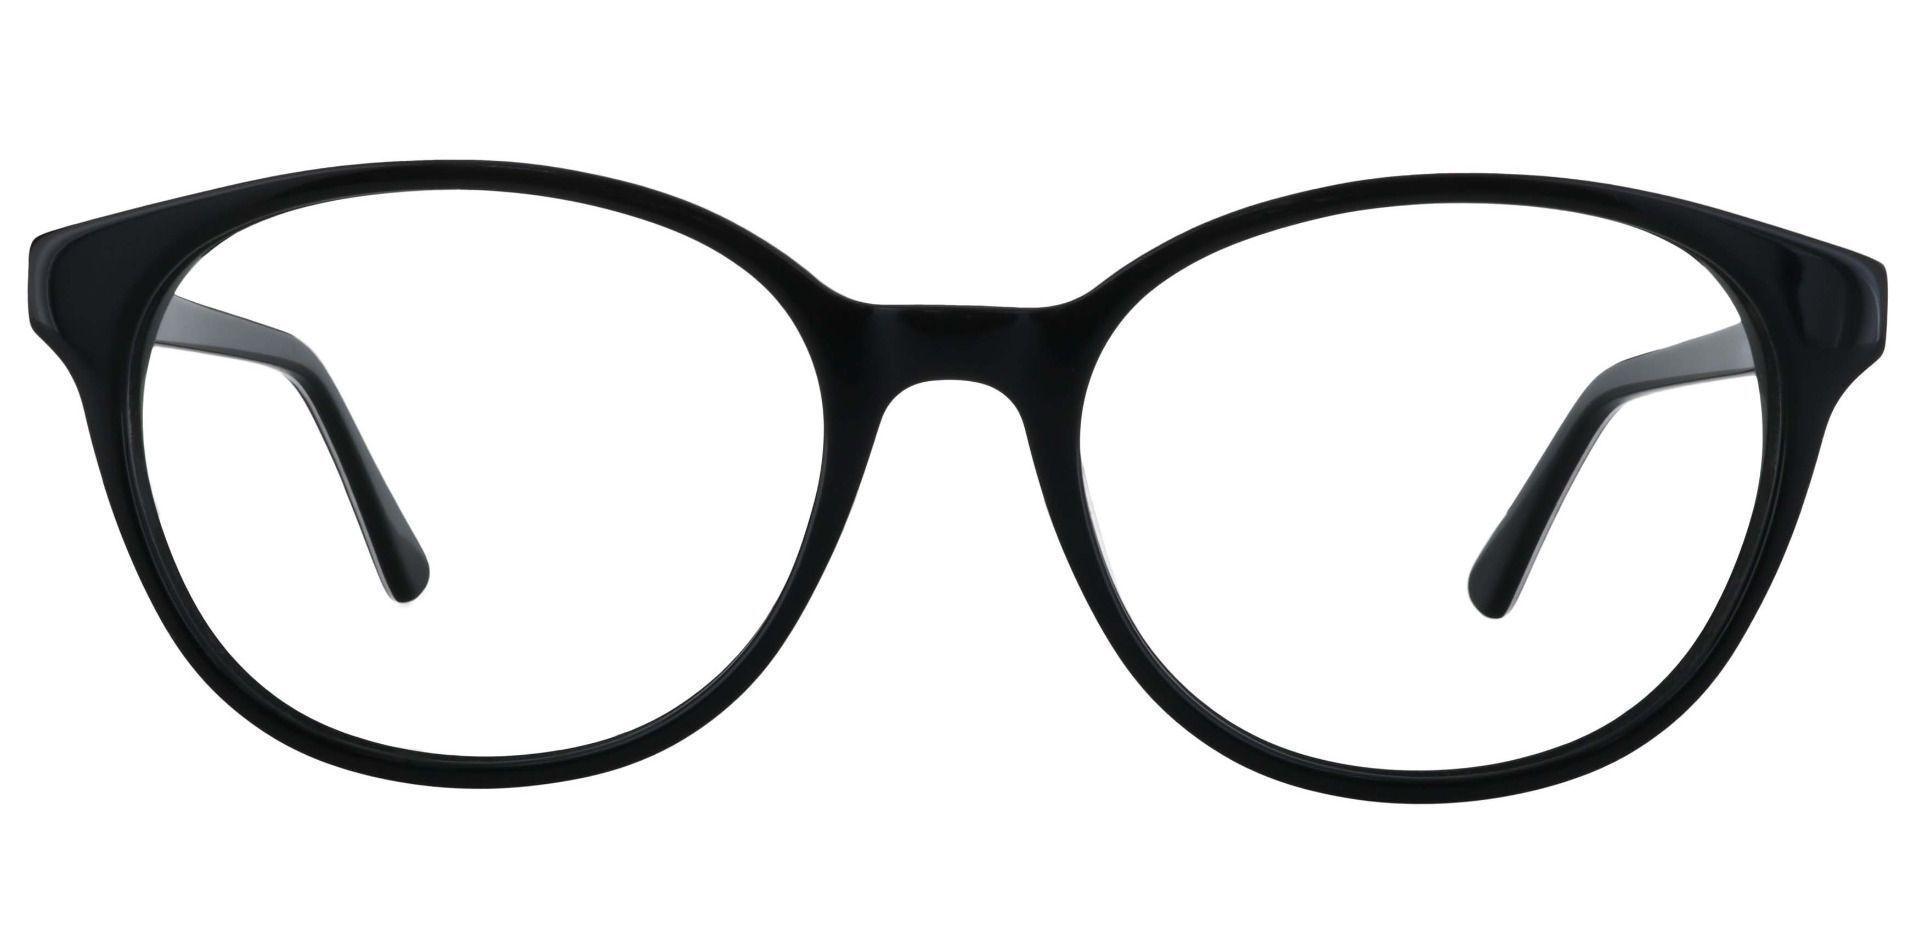 Cadet Oval Prescription Glasses - Black